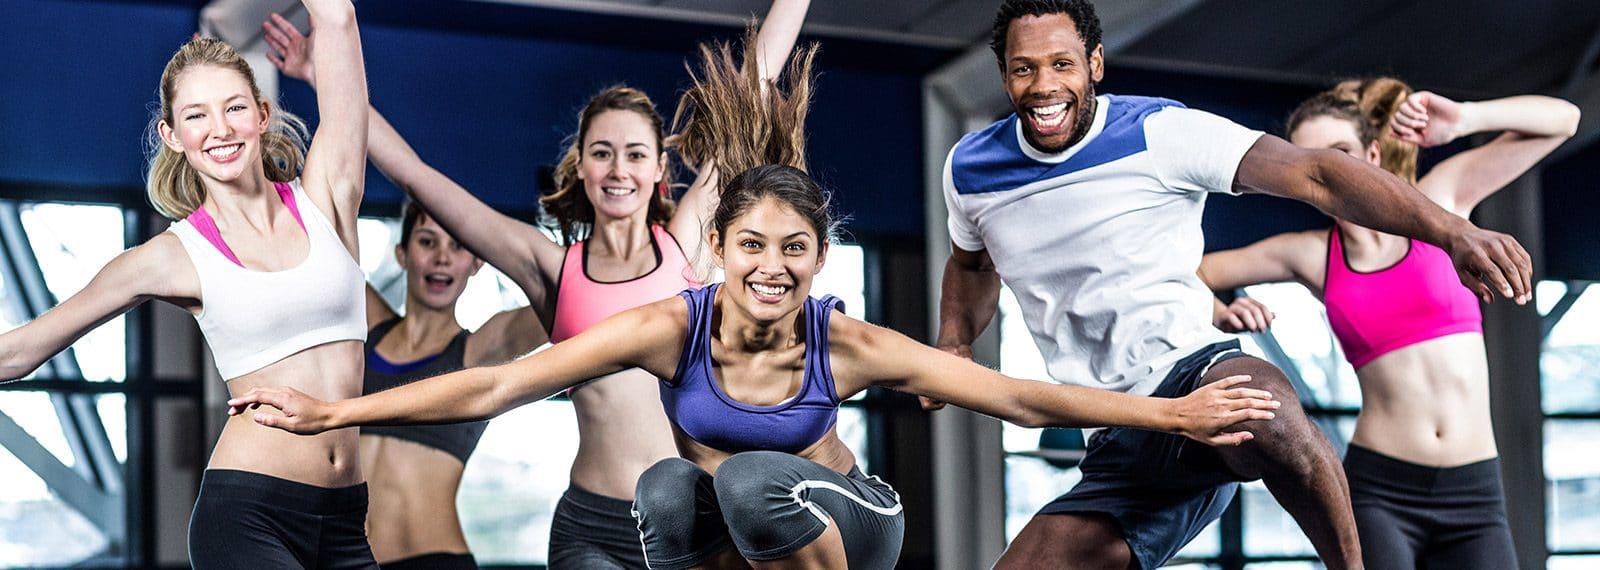 Neueröffnung Fitness-Loft